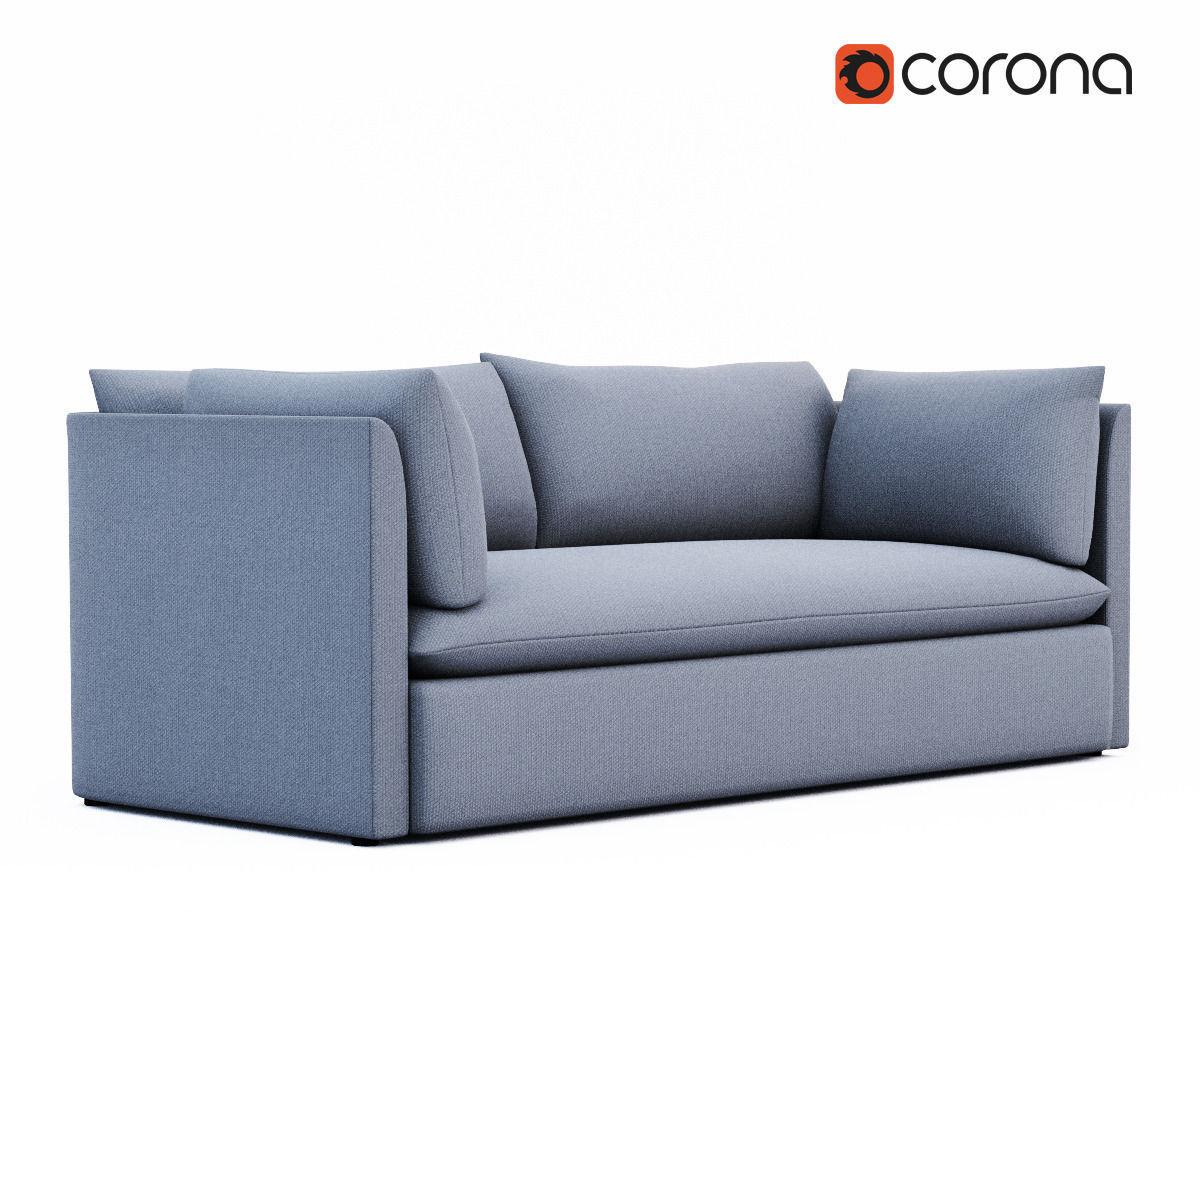 Charming West Elm Shelter Sofa 3d Model Max Obj 3ds Fbx Dxf Dae 1 ...